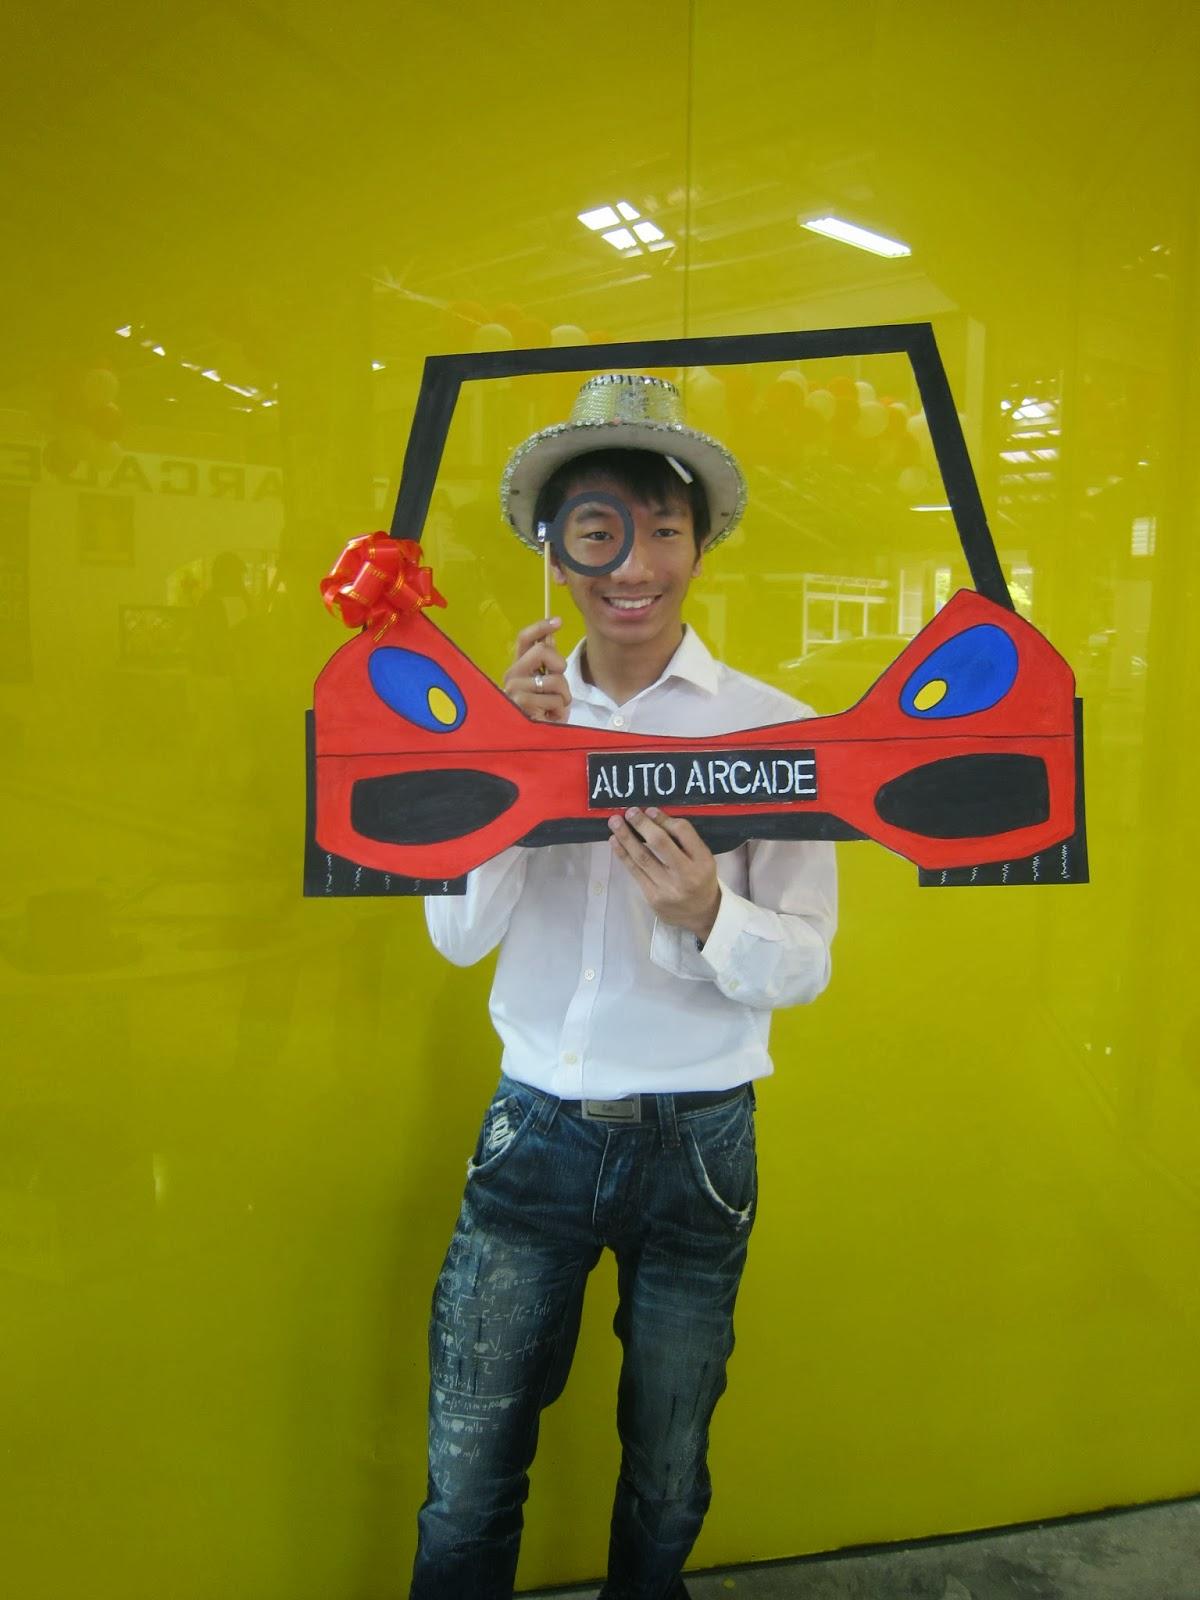 Auto Arcade CNY Opening House 2014